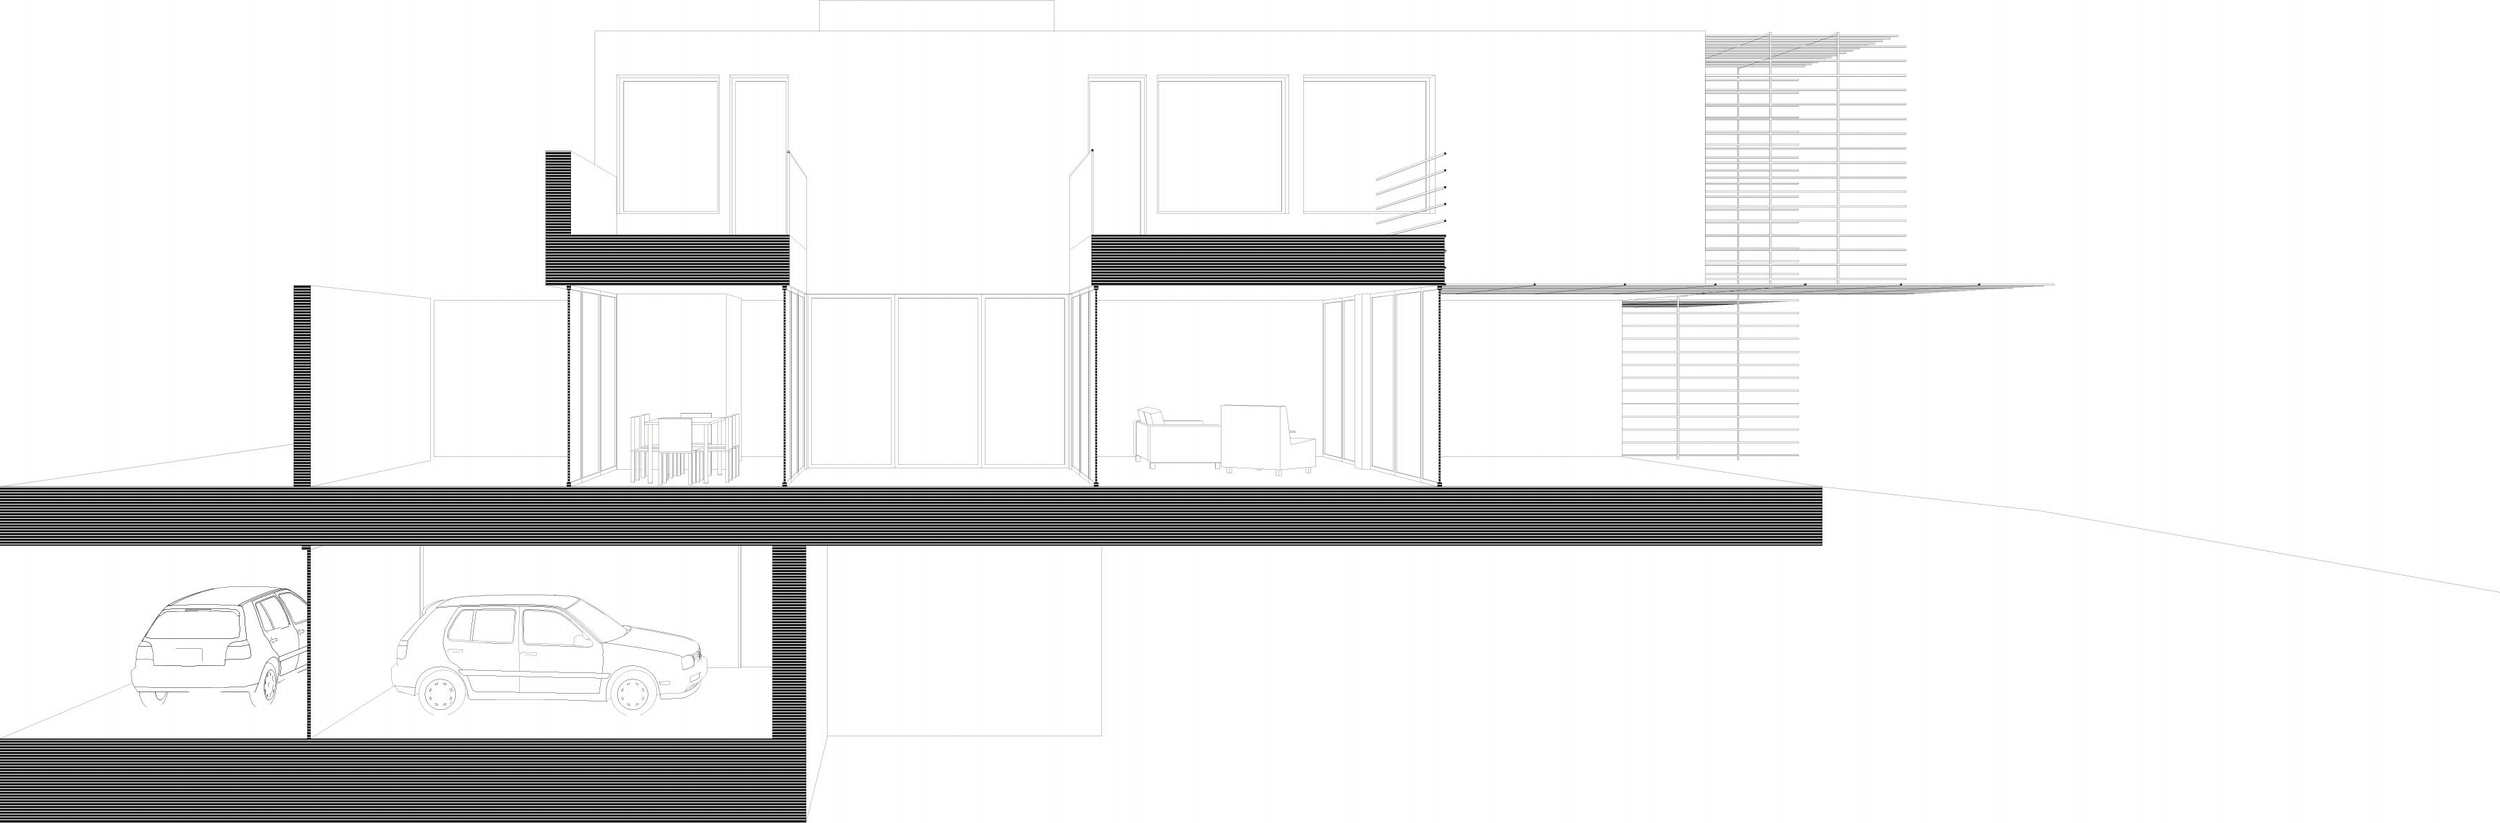 section_2.jpg